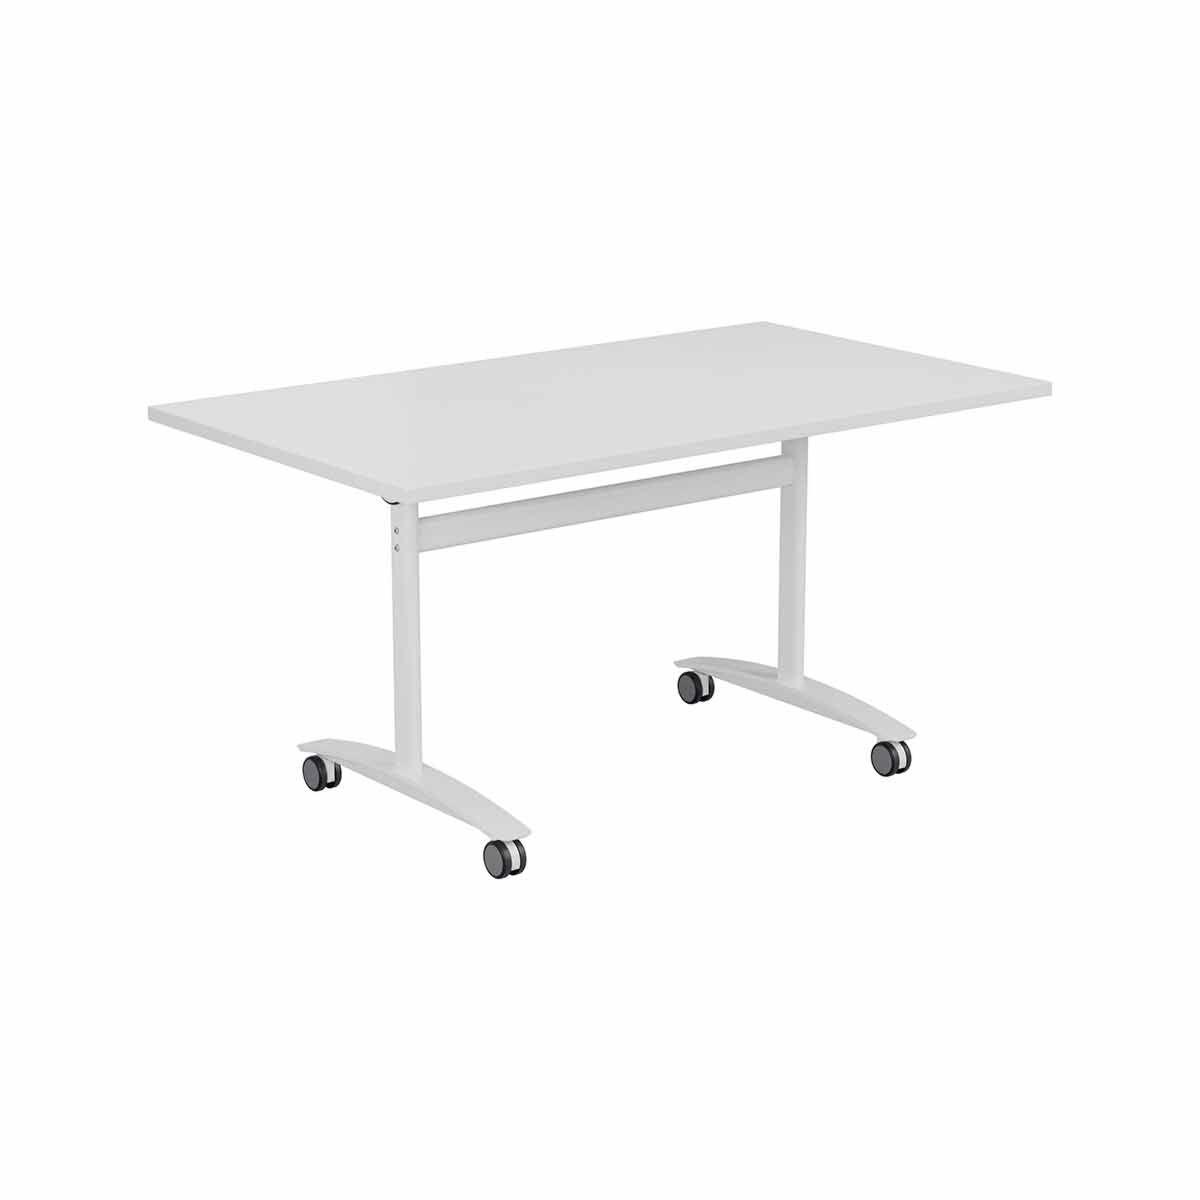 Tabilo Tilt Top Table Frame with White Curved Leg 1600 x 800mm White